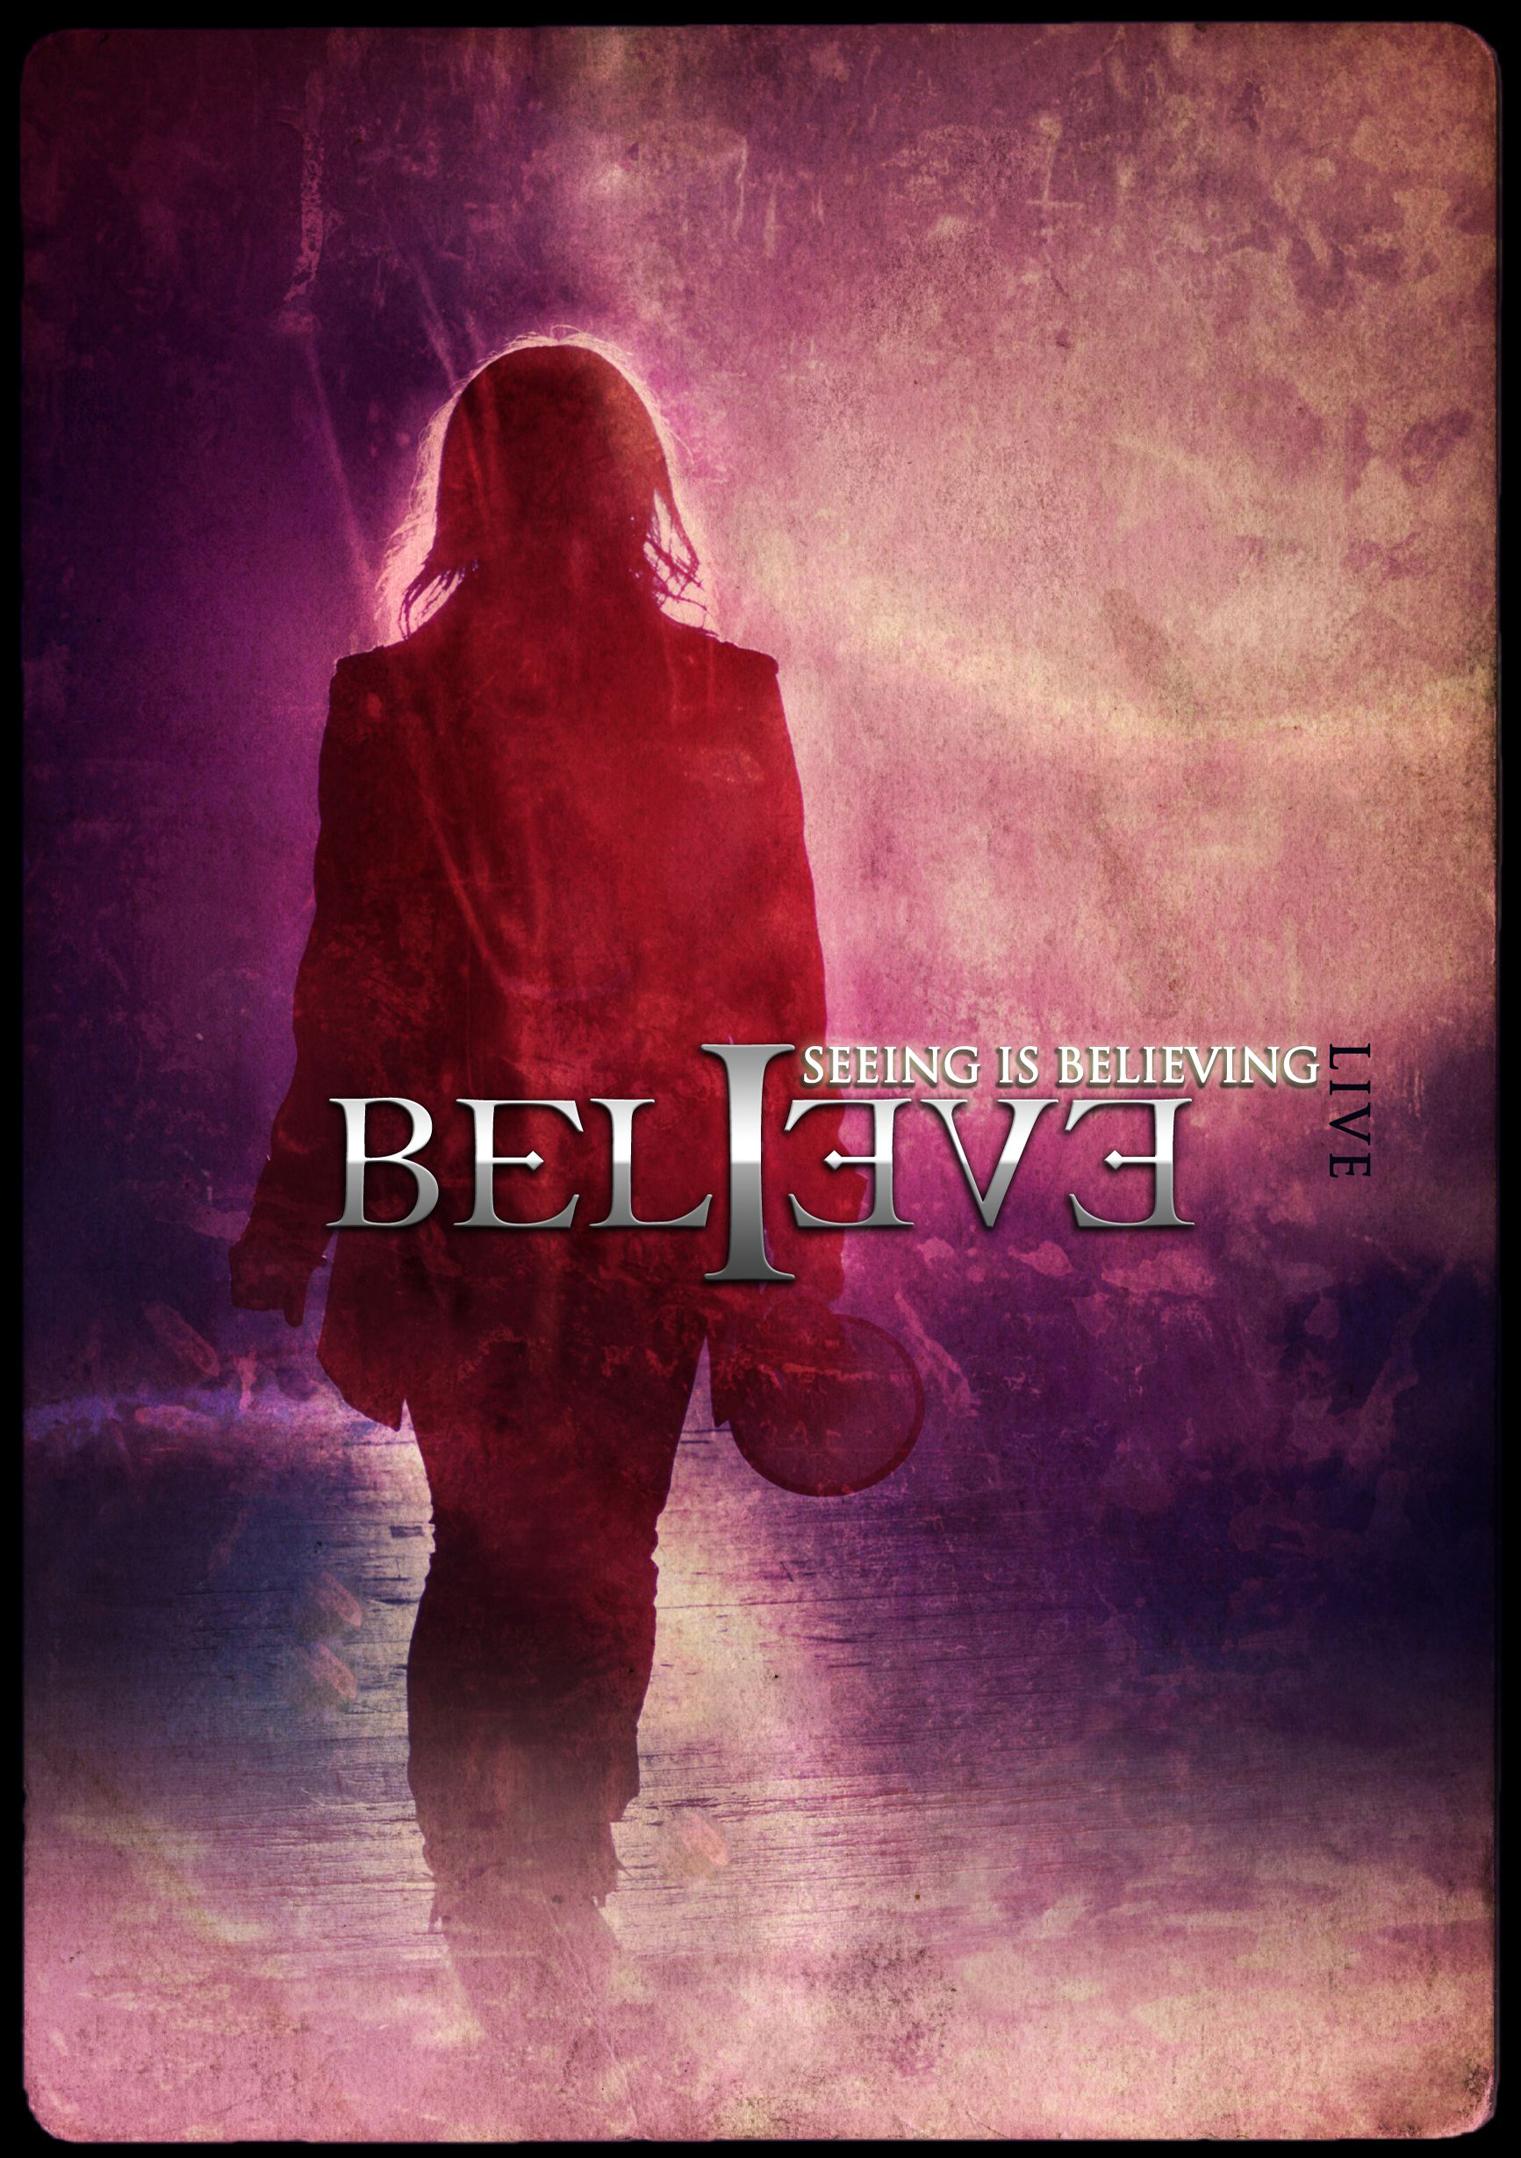 Believe: Seeing is Believing - Live